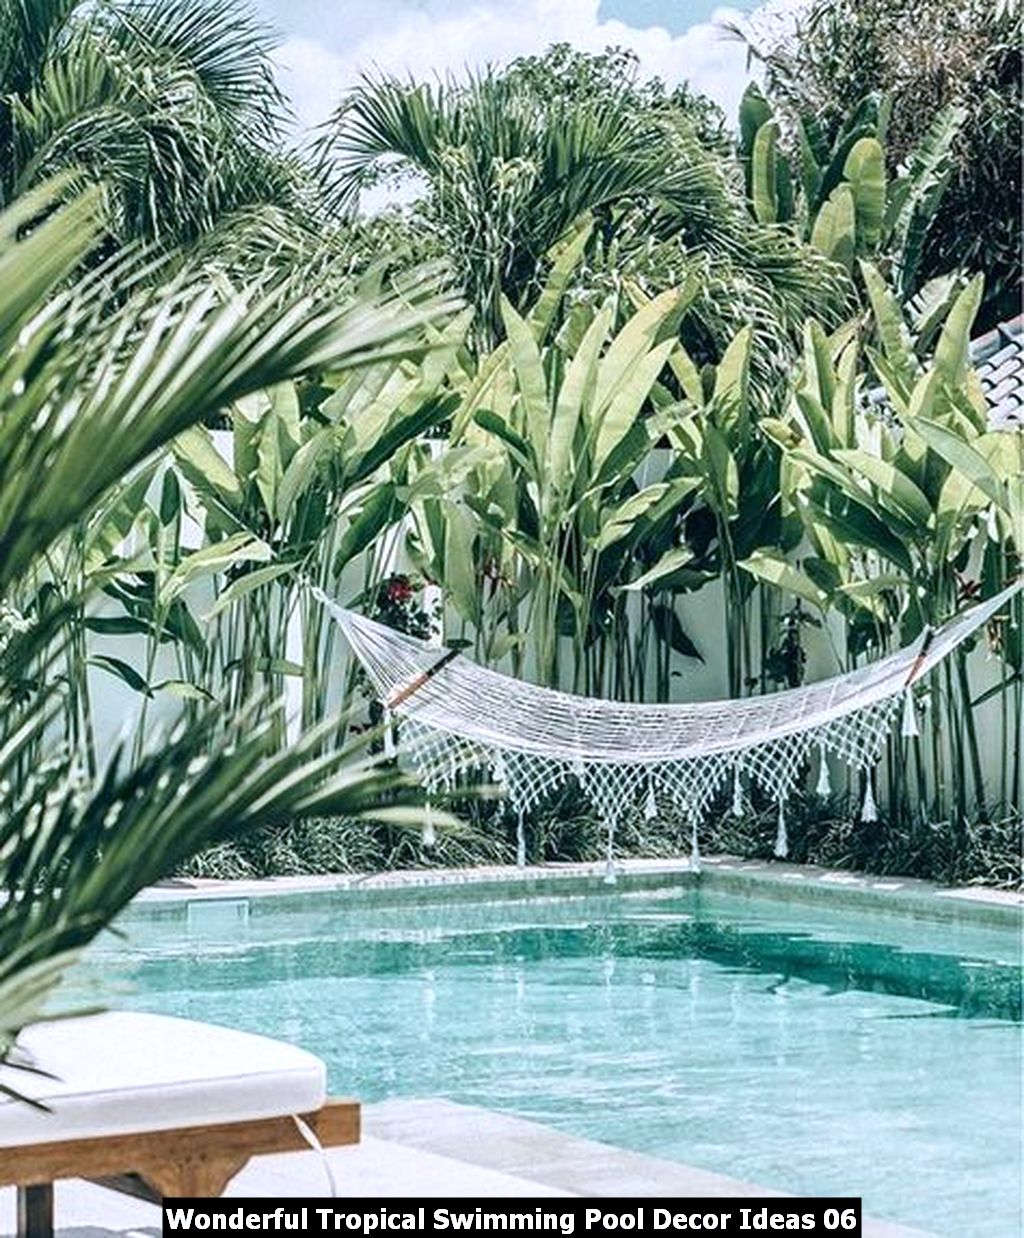 Wonderful Tropical Swimming Pool Decor Ideas 06